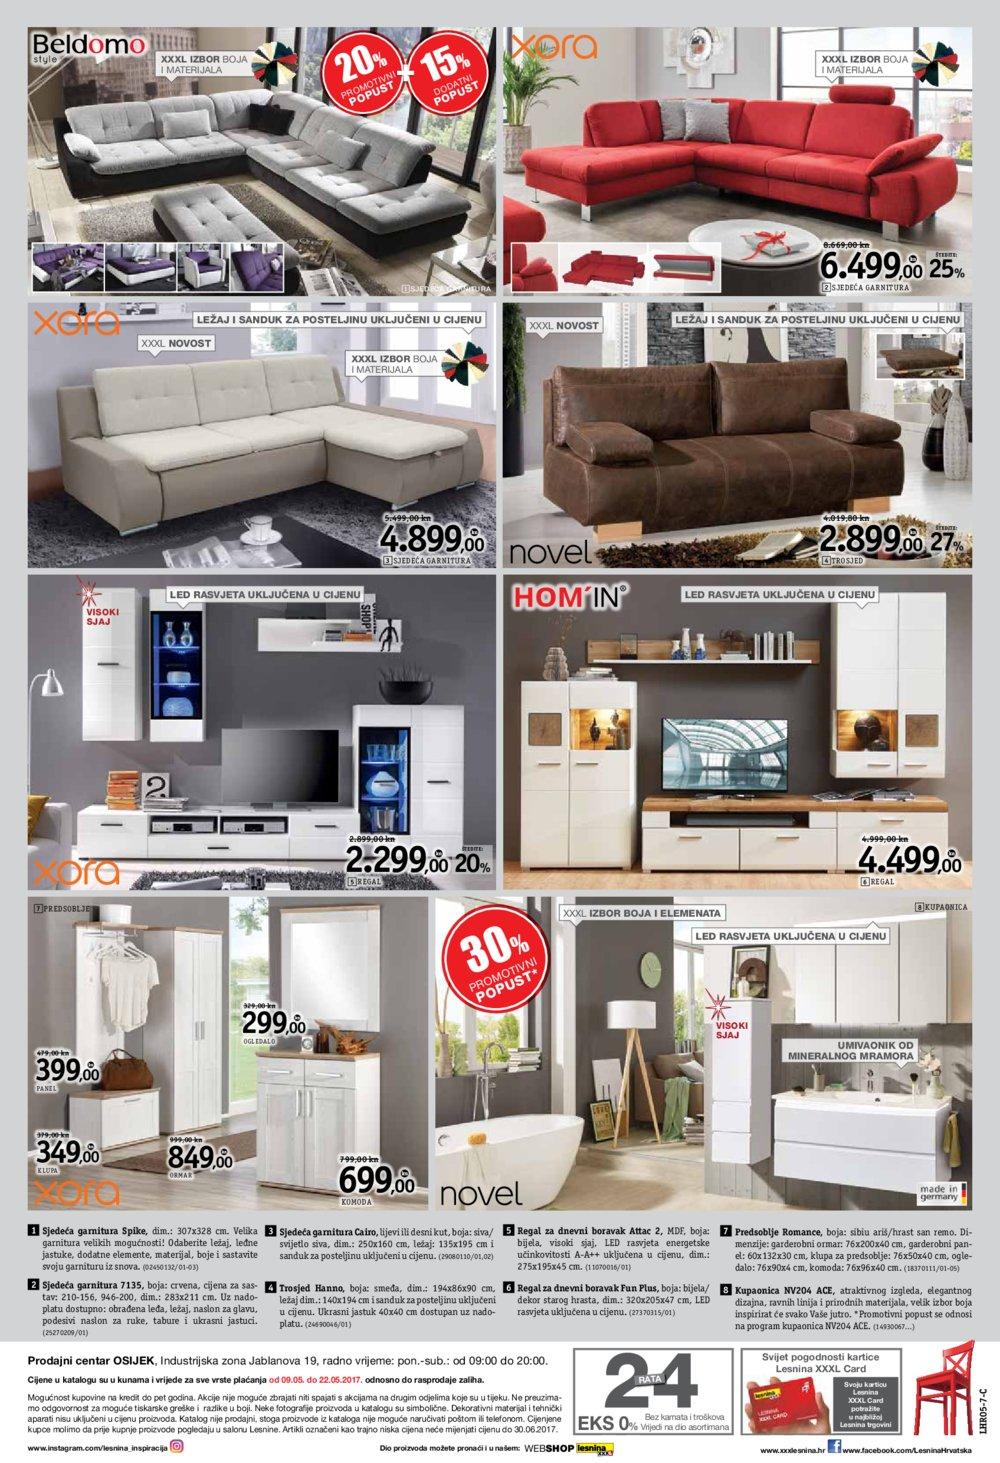 Lesnina katalog XXXL kvaliteta stanovanja do 22.05.